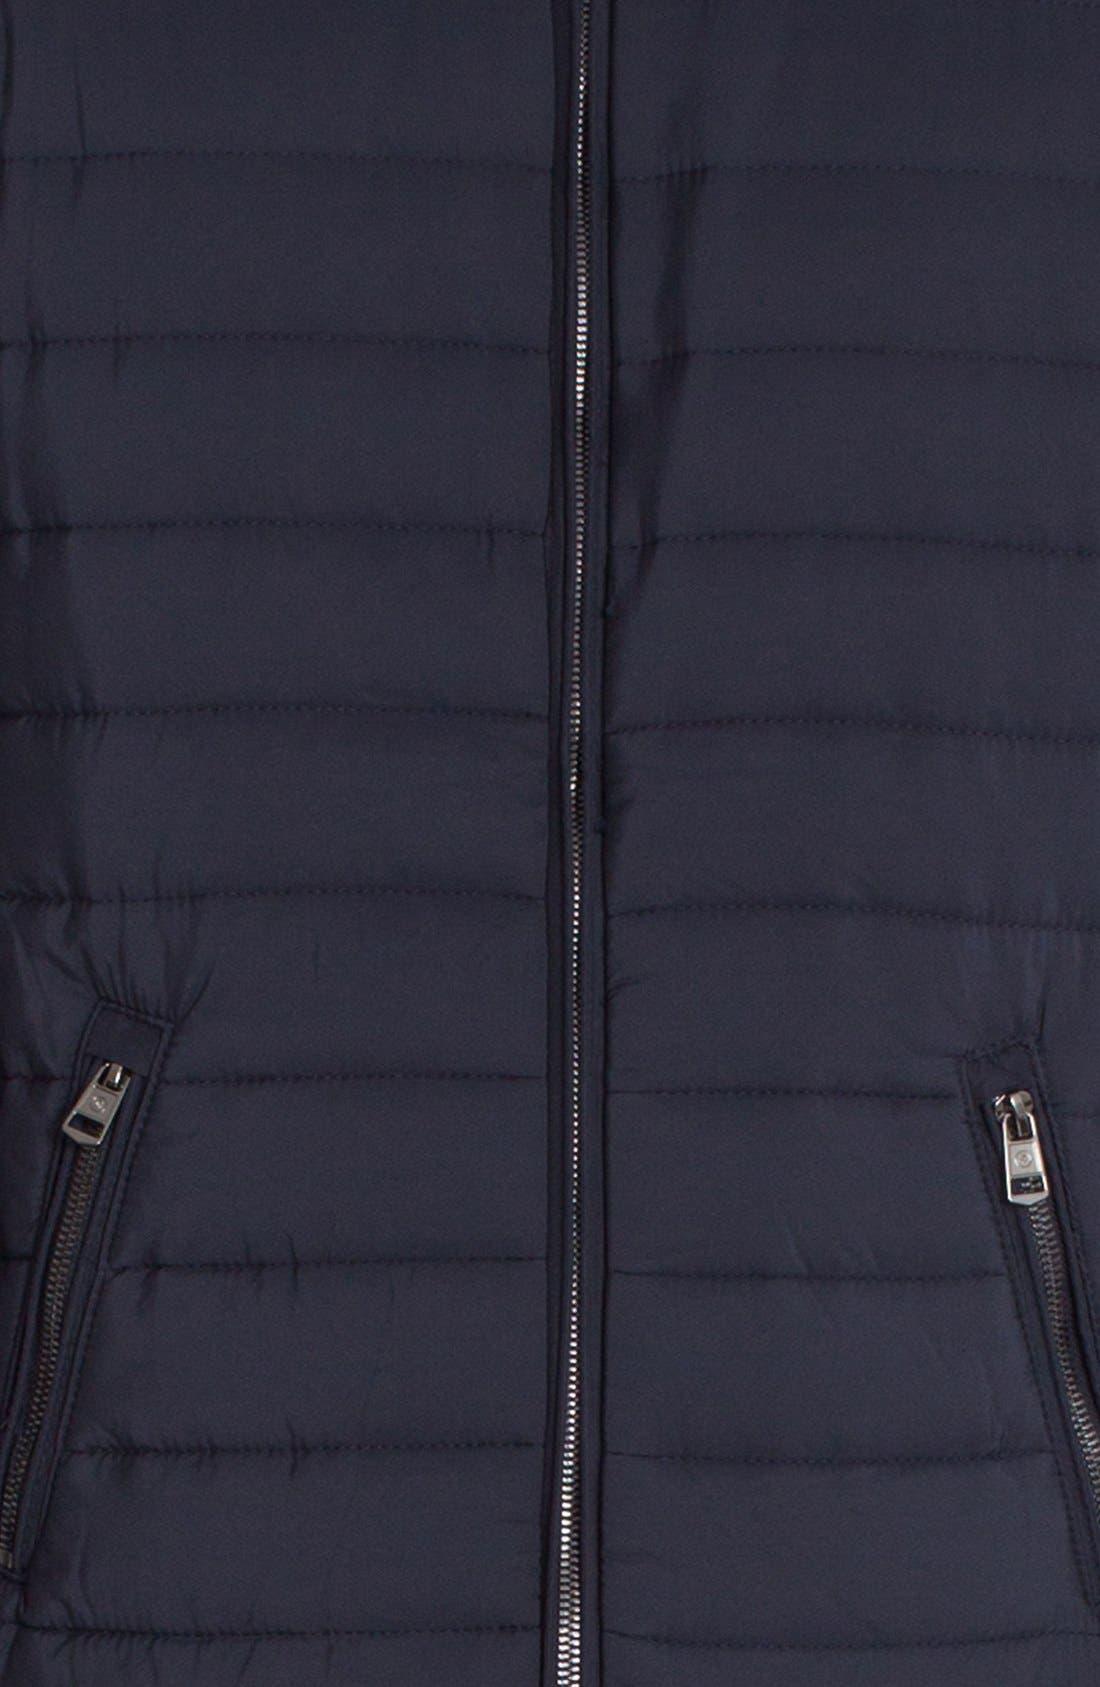 Tristan Mixed Media Jacket,                             Alternate thumbnail 5, color,                             Navy